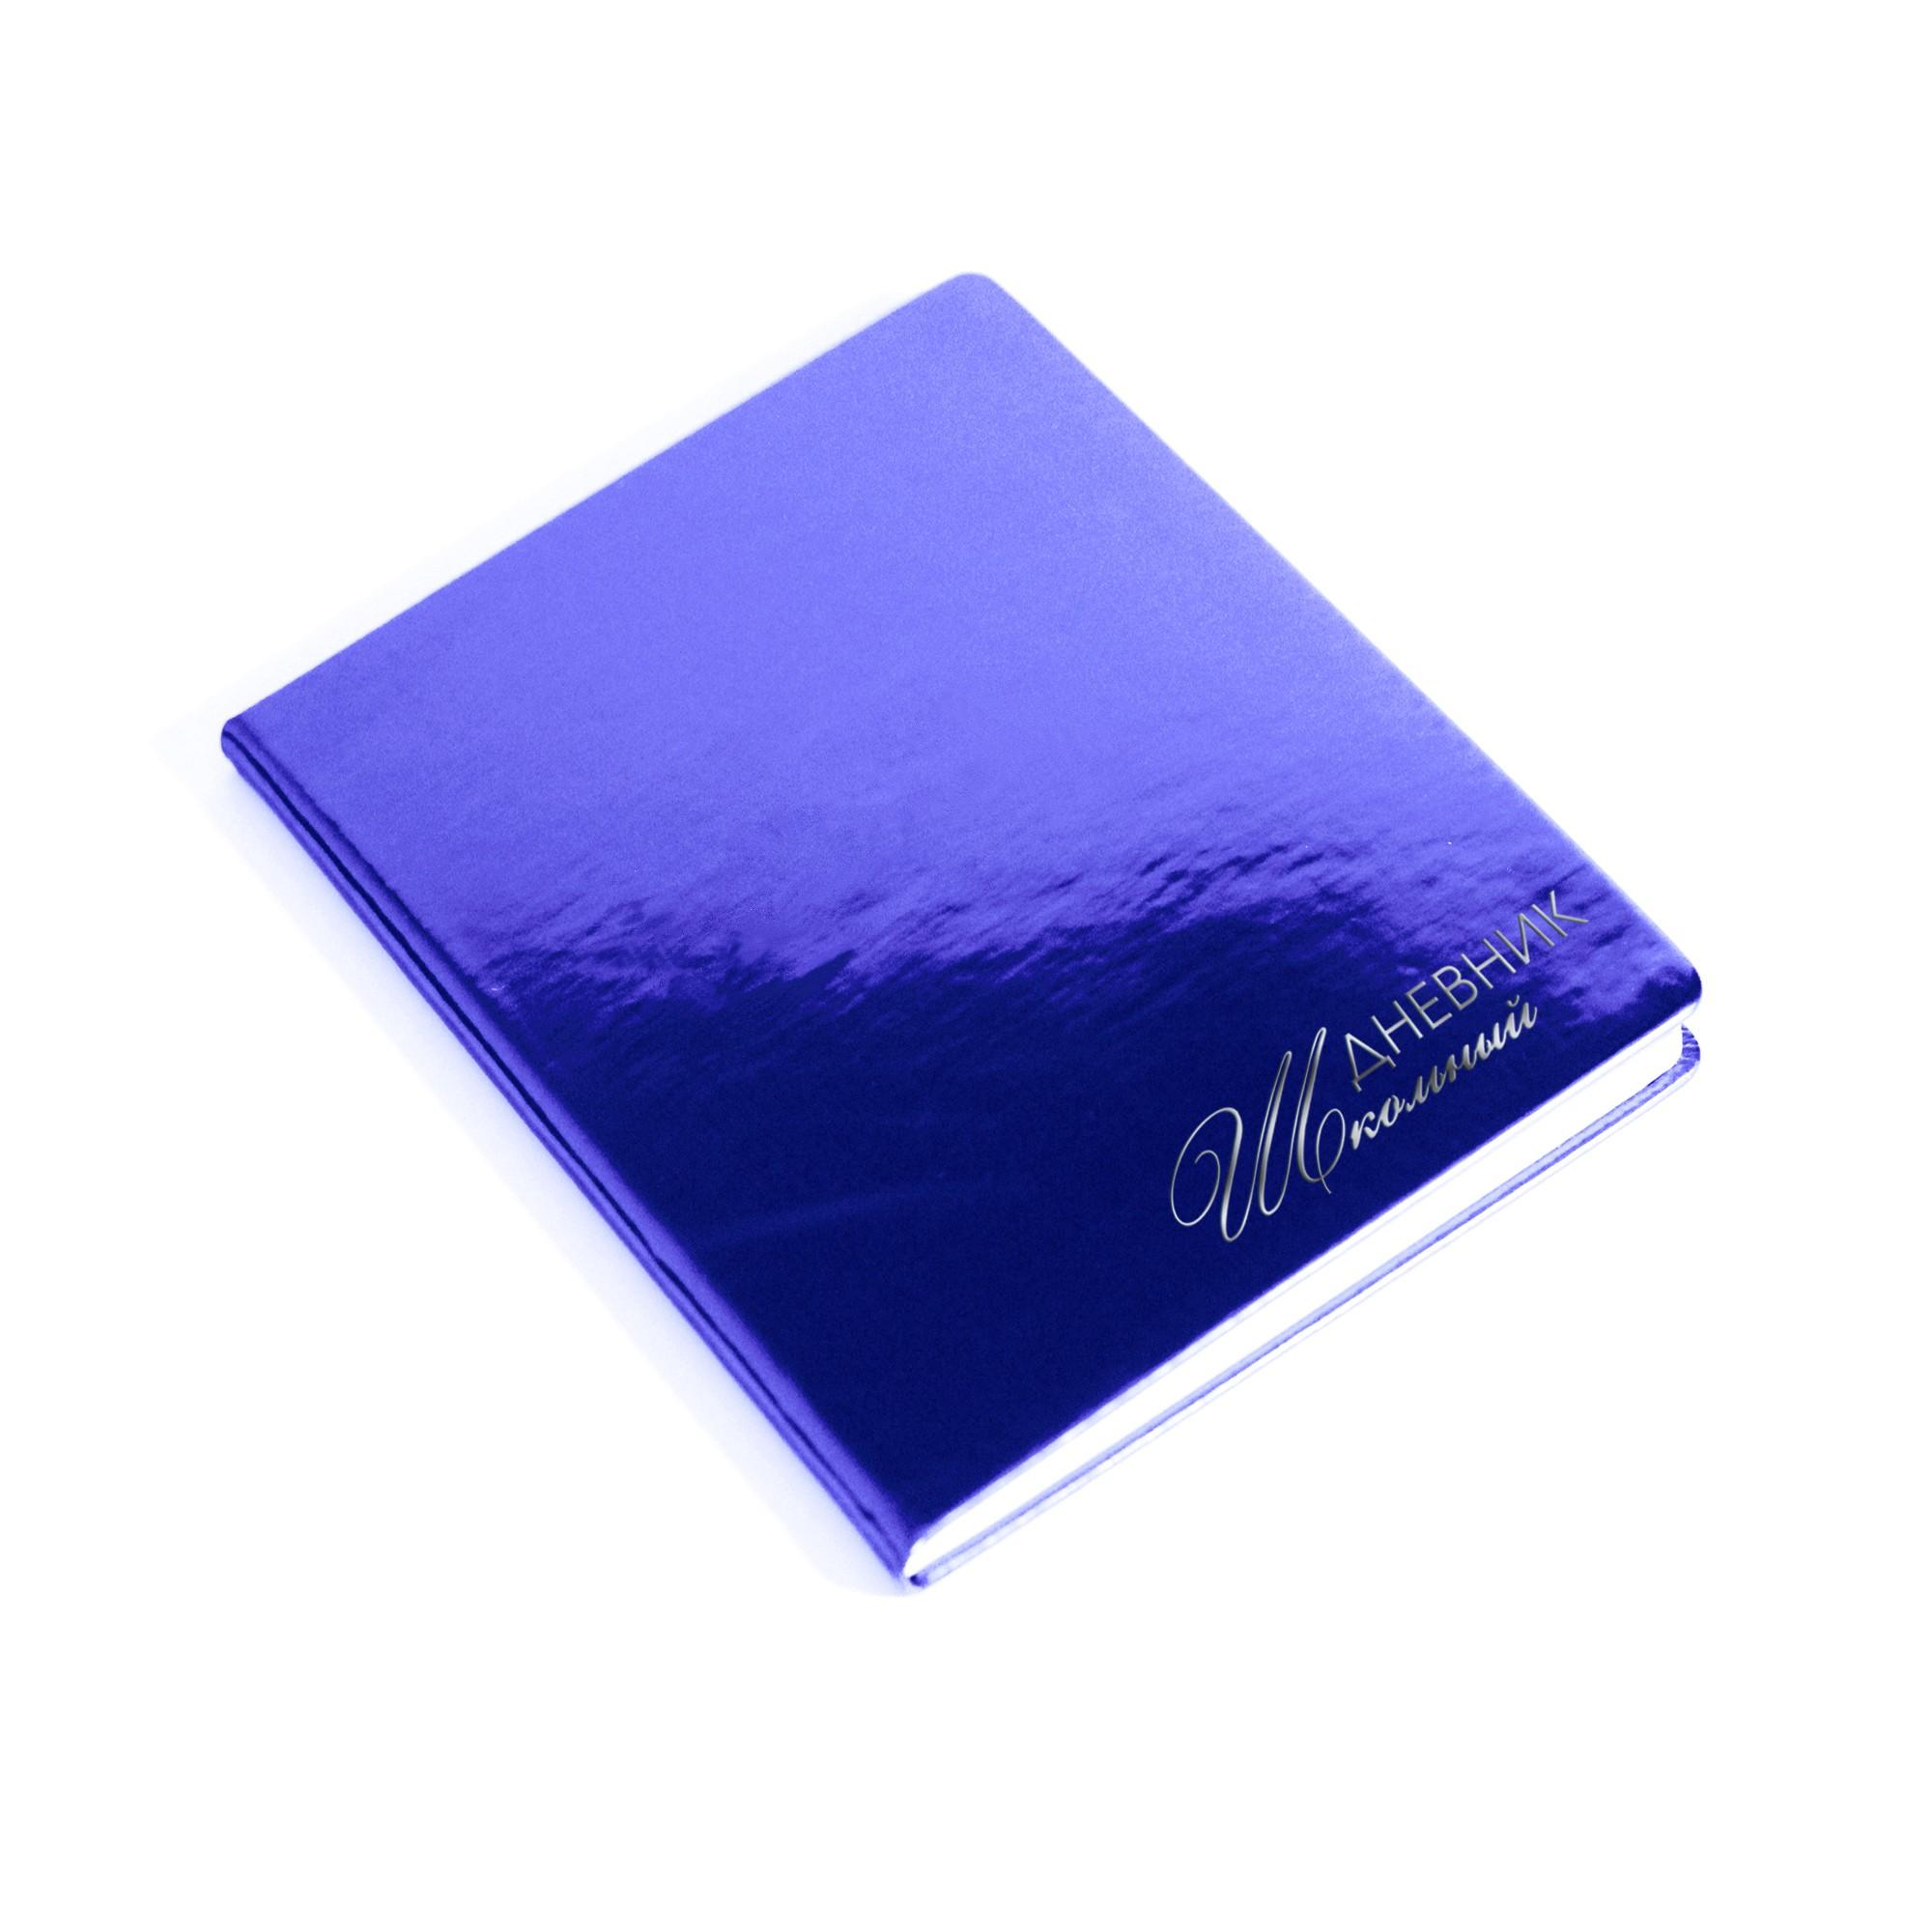 Дневник ст кл Mirrors. Синий